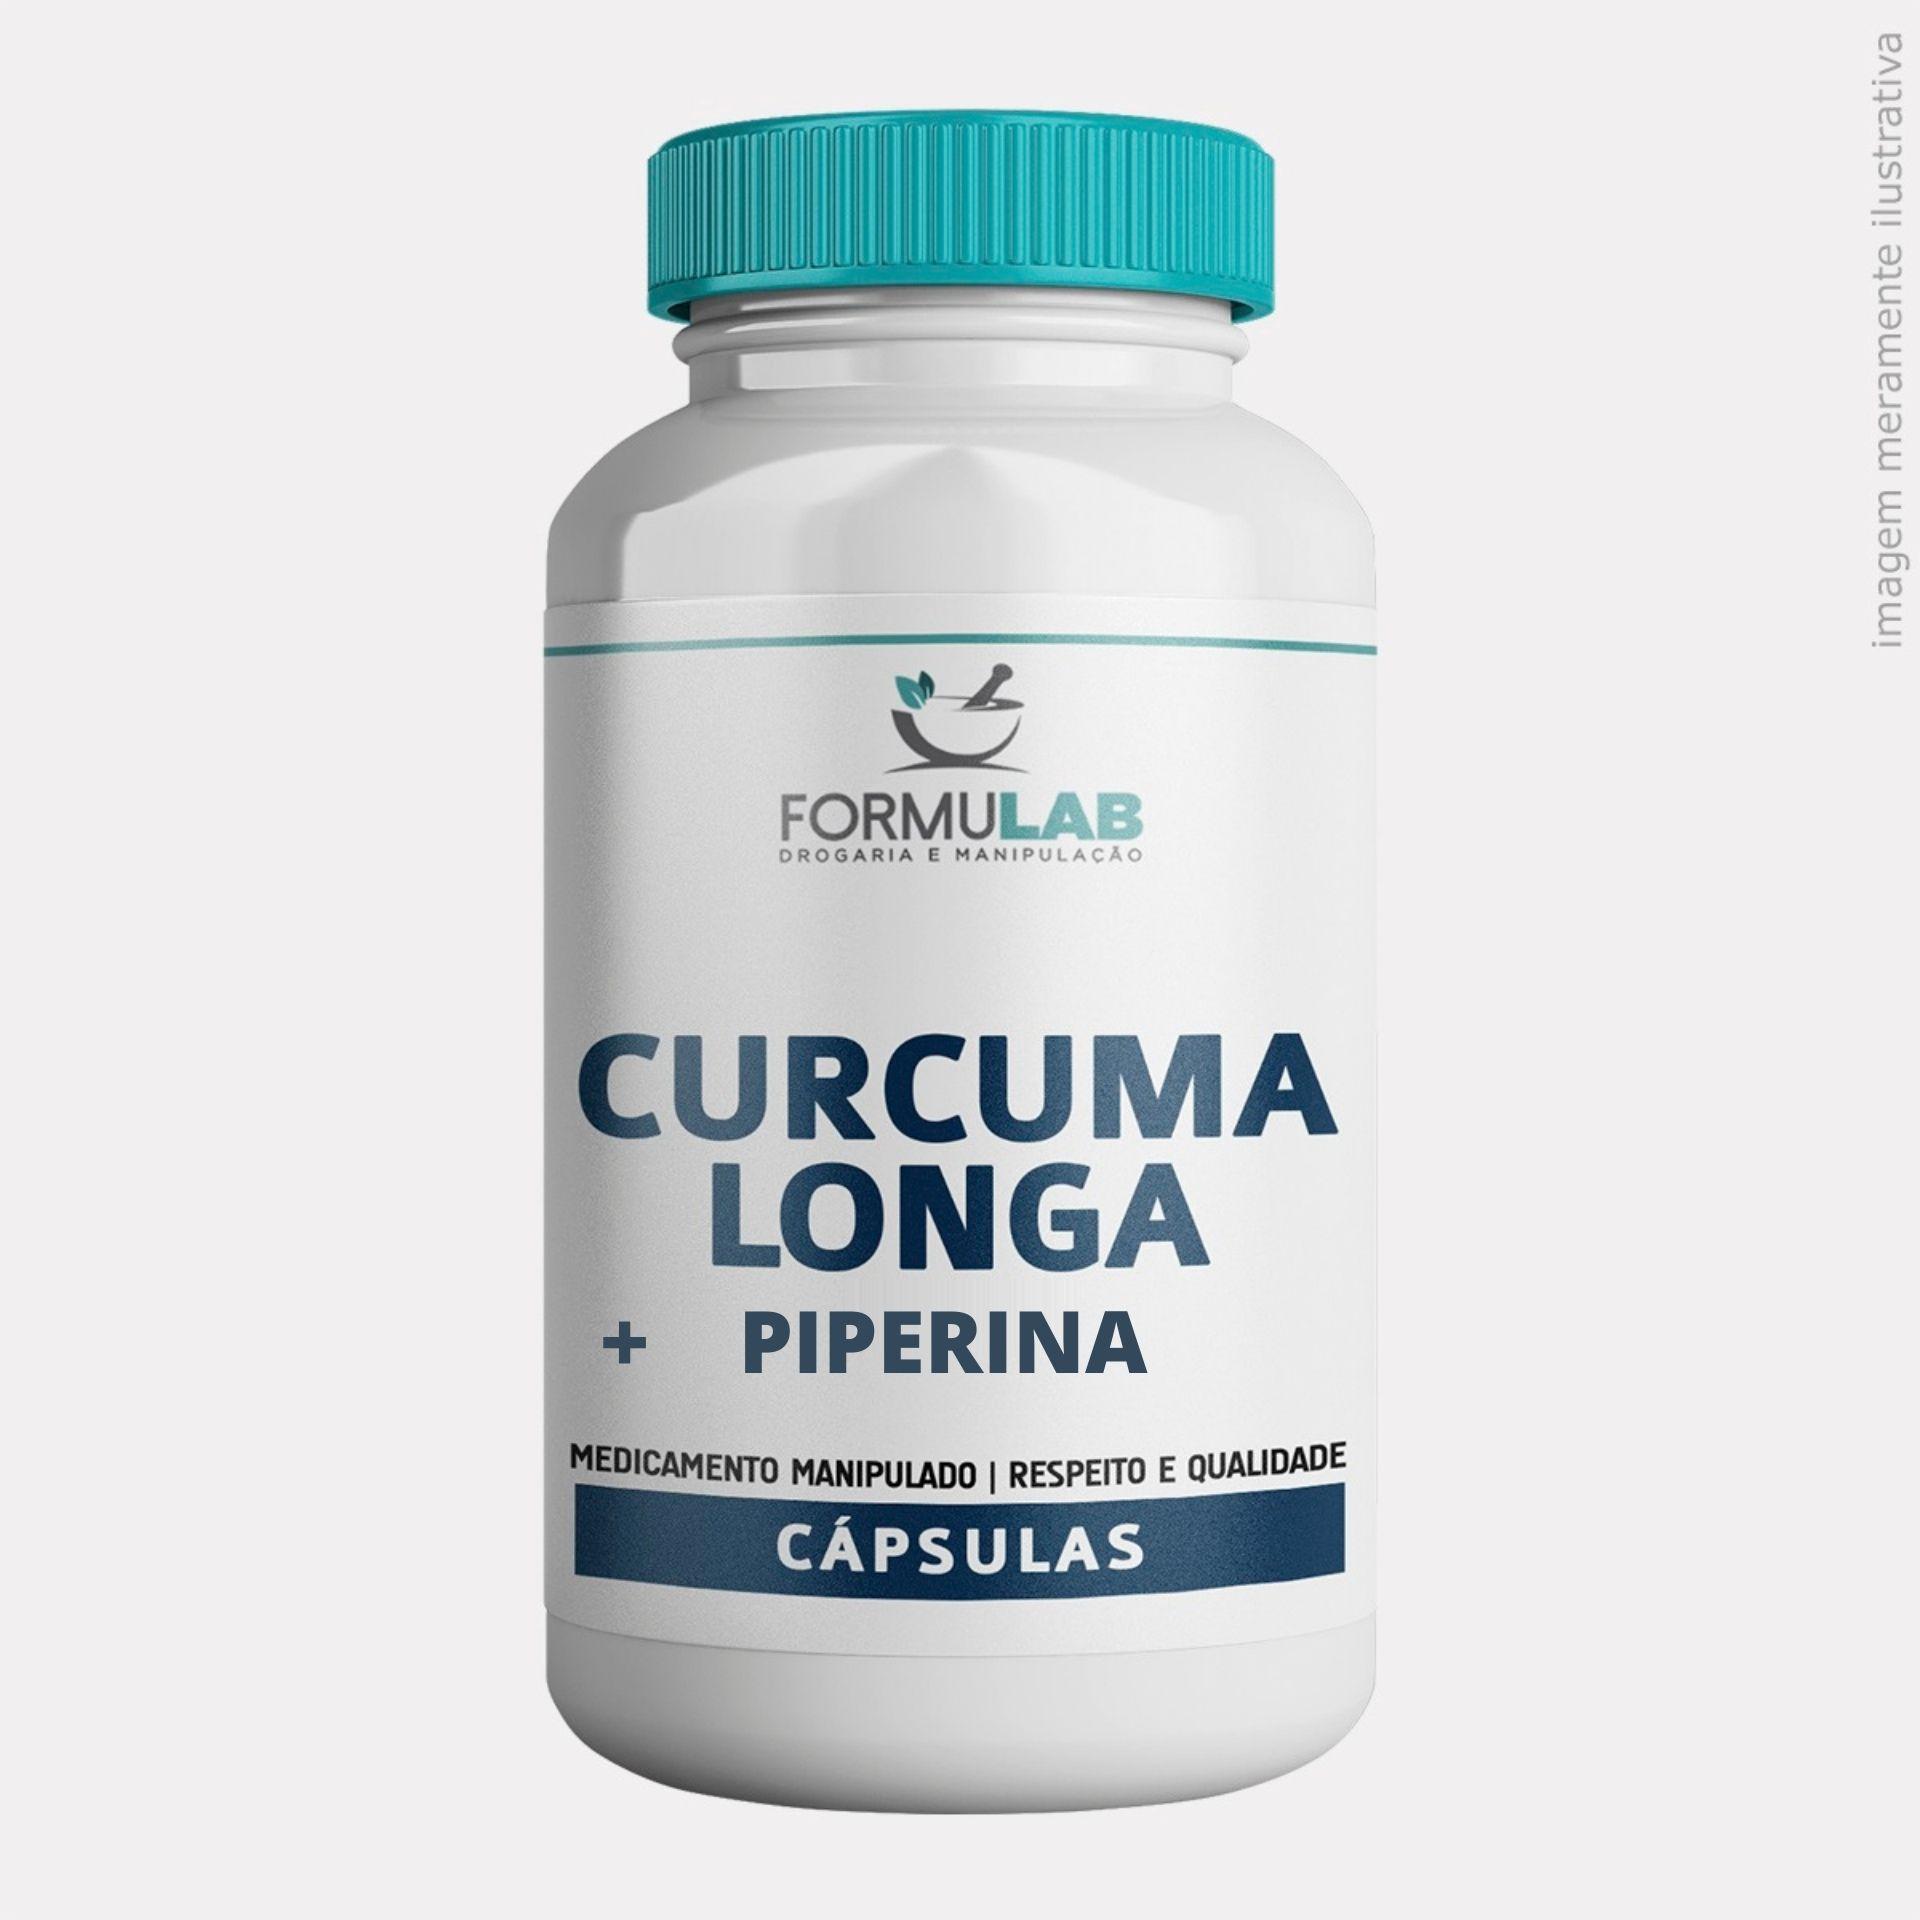 CURCUMA LONGA 500MG + PIPERINA 7,5mg (PIMENTA PRETA)